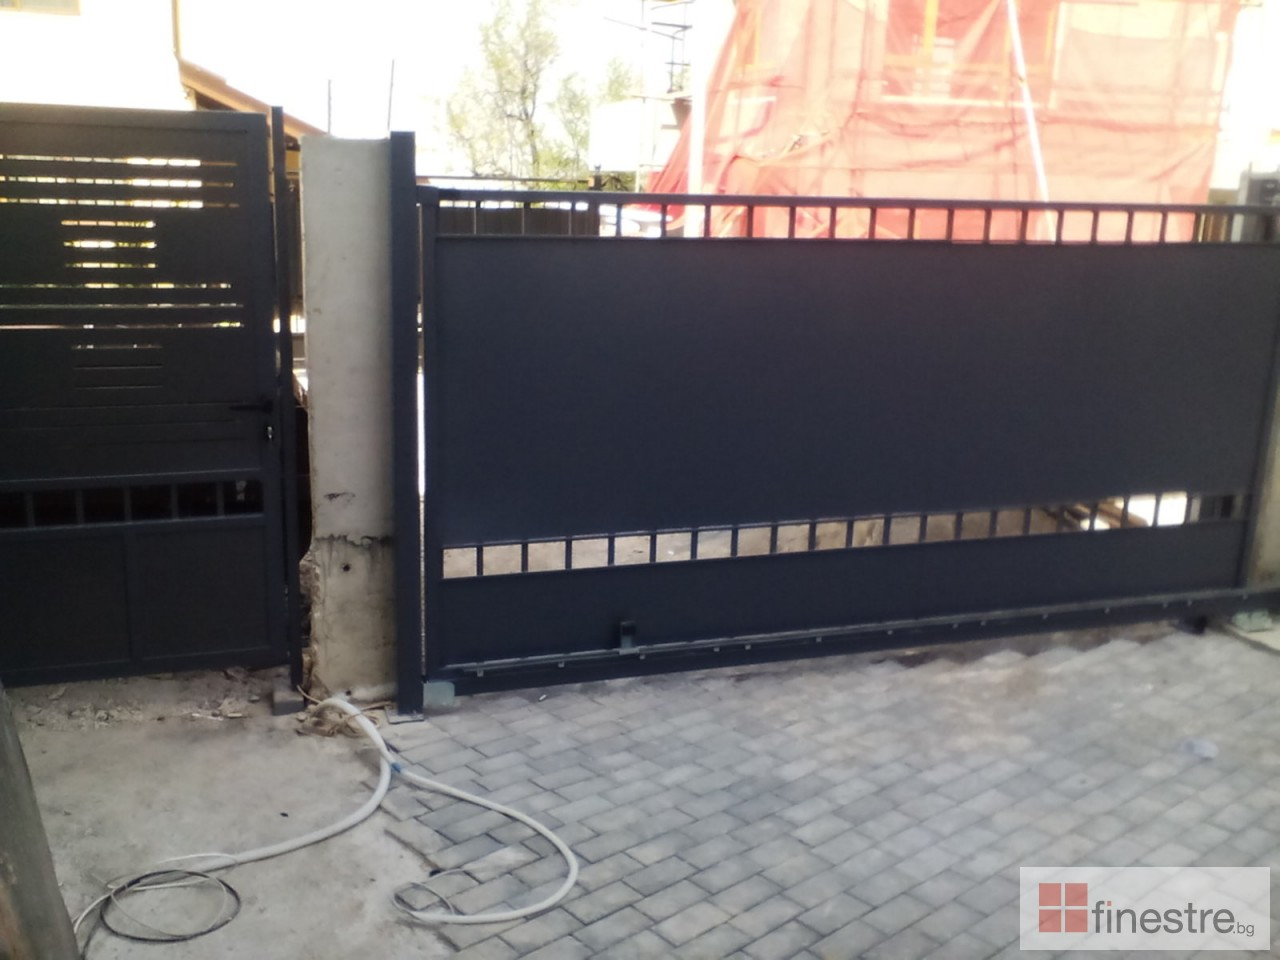 Еталбонд  ,ком.метална ограда с еталбонд, конзолна врата и алуминиев парапет 6